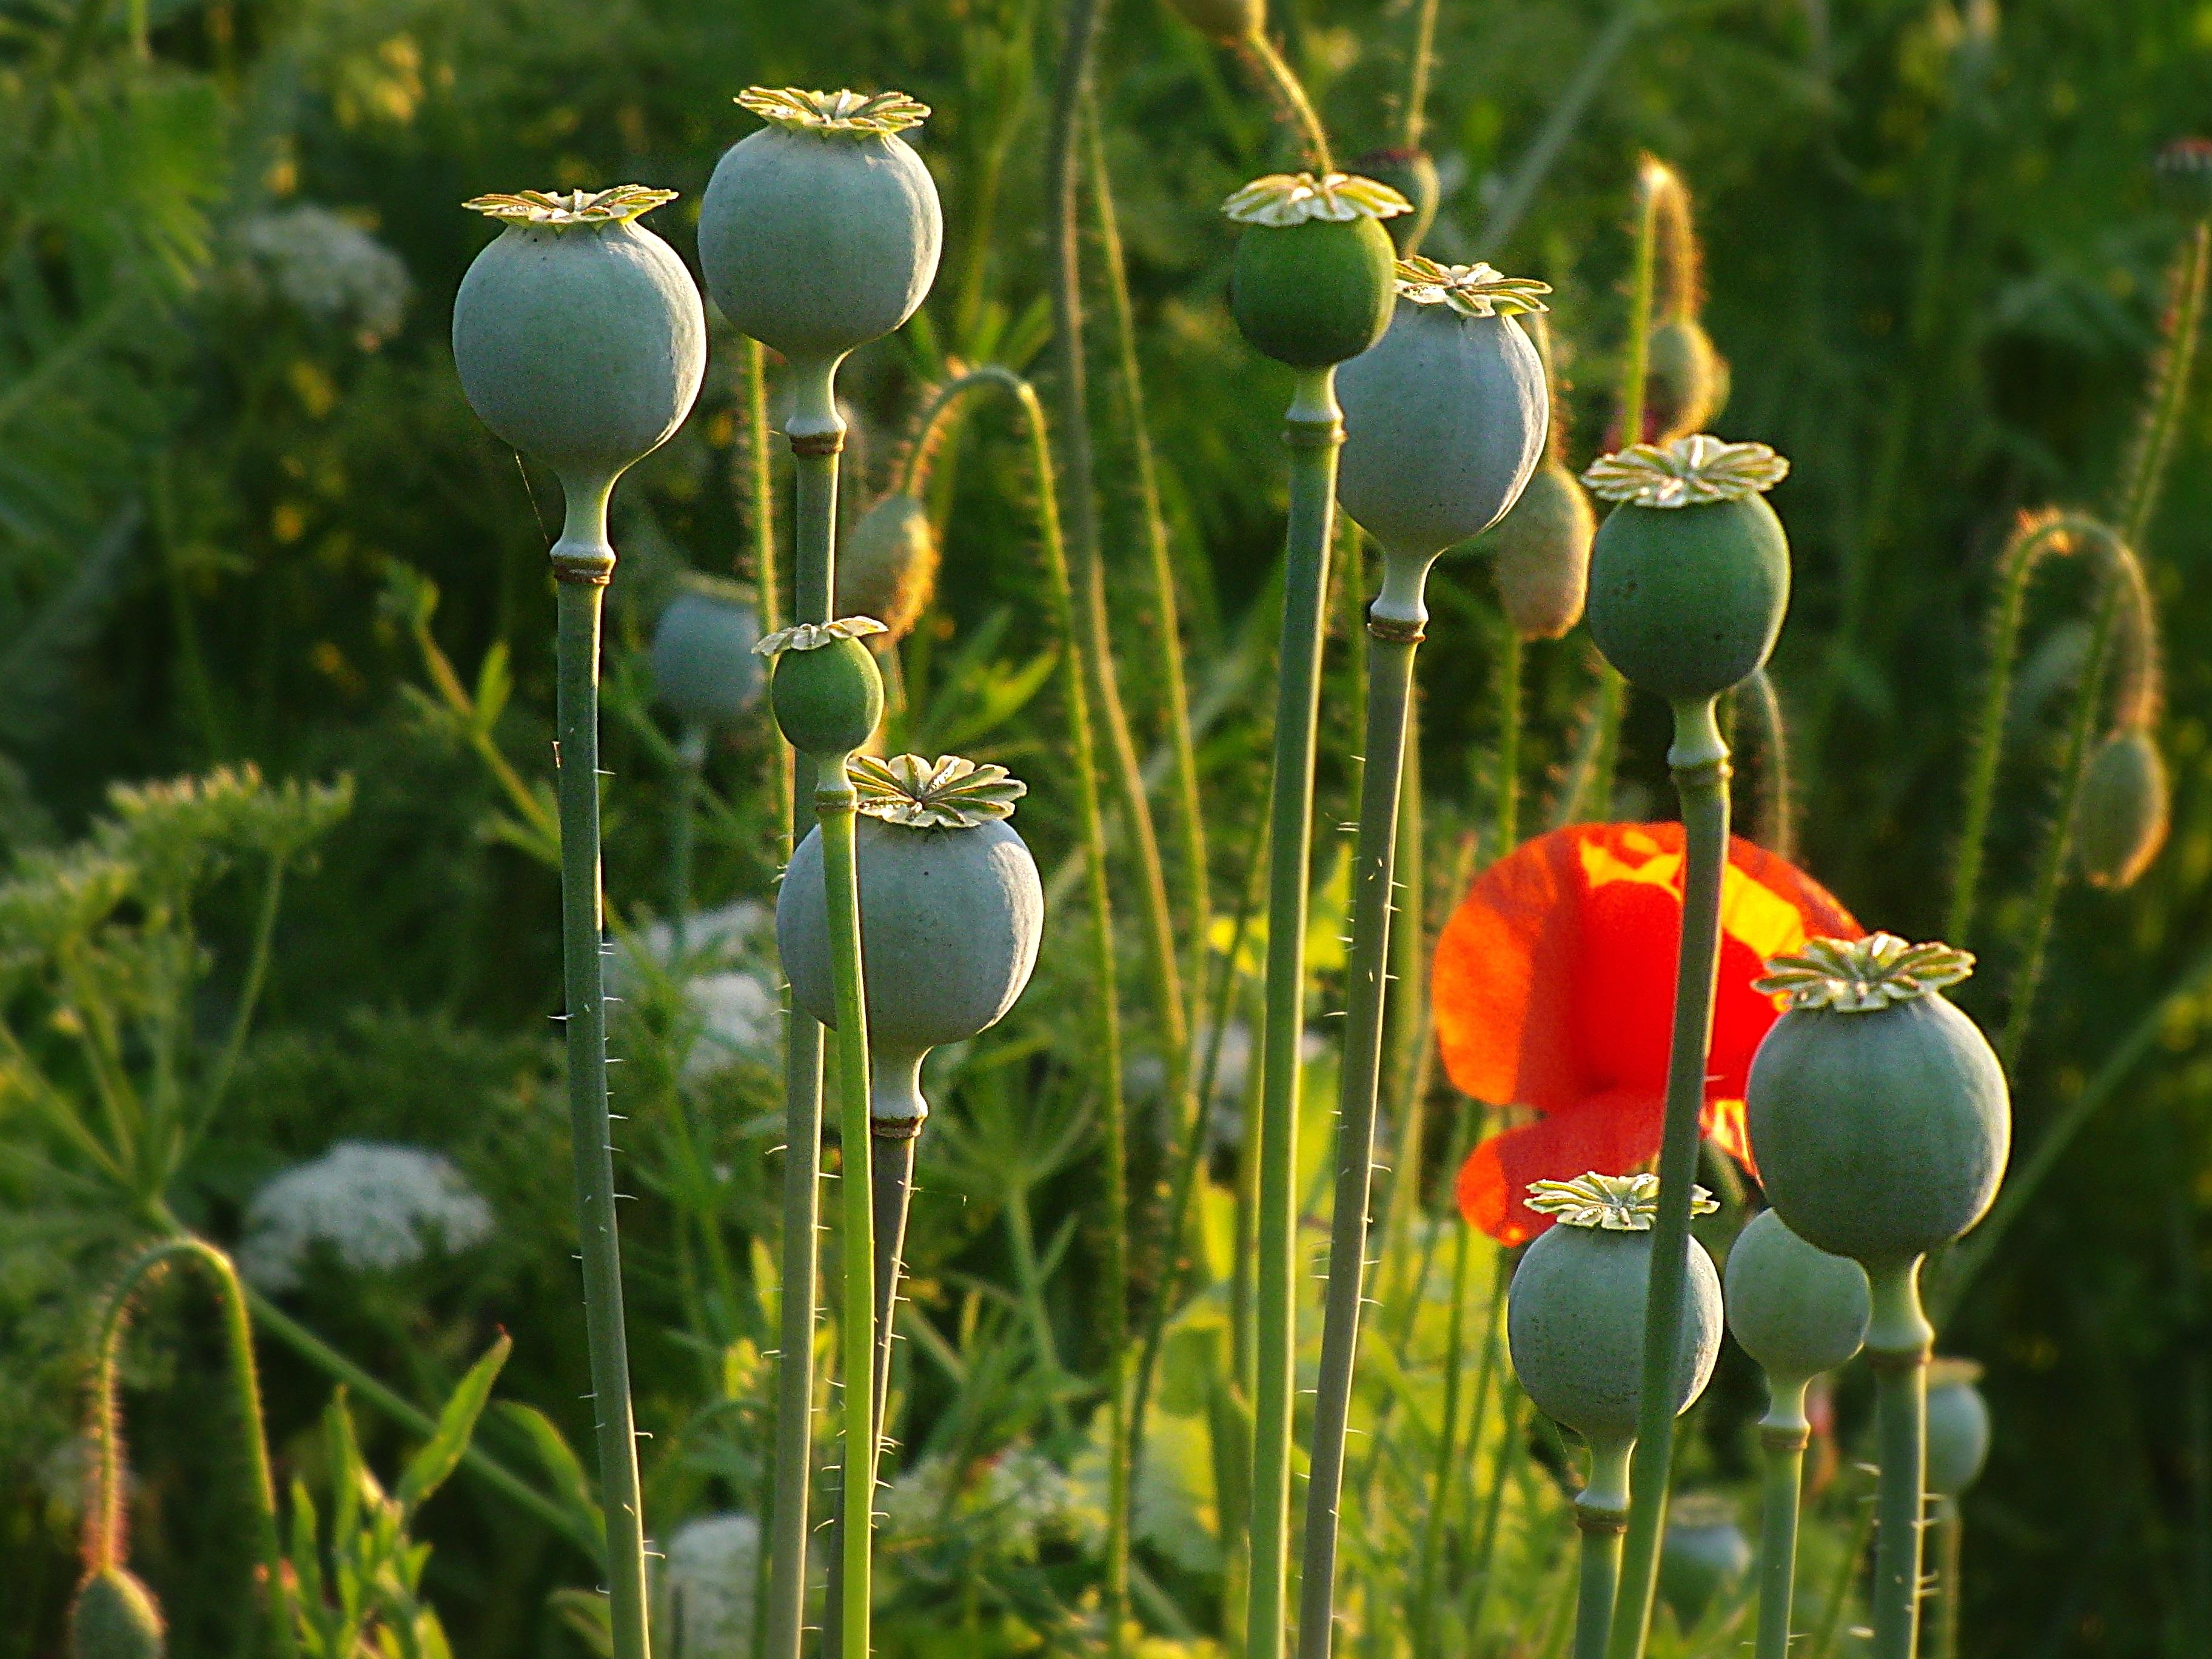 Free Images Klatschmohn Poppy Flower Red Field Of Poppies